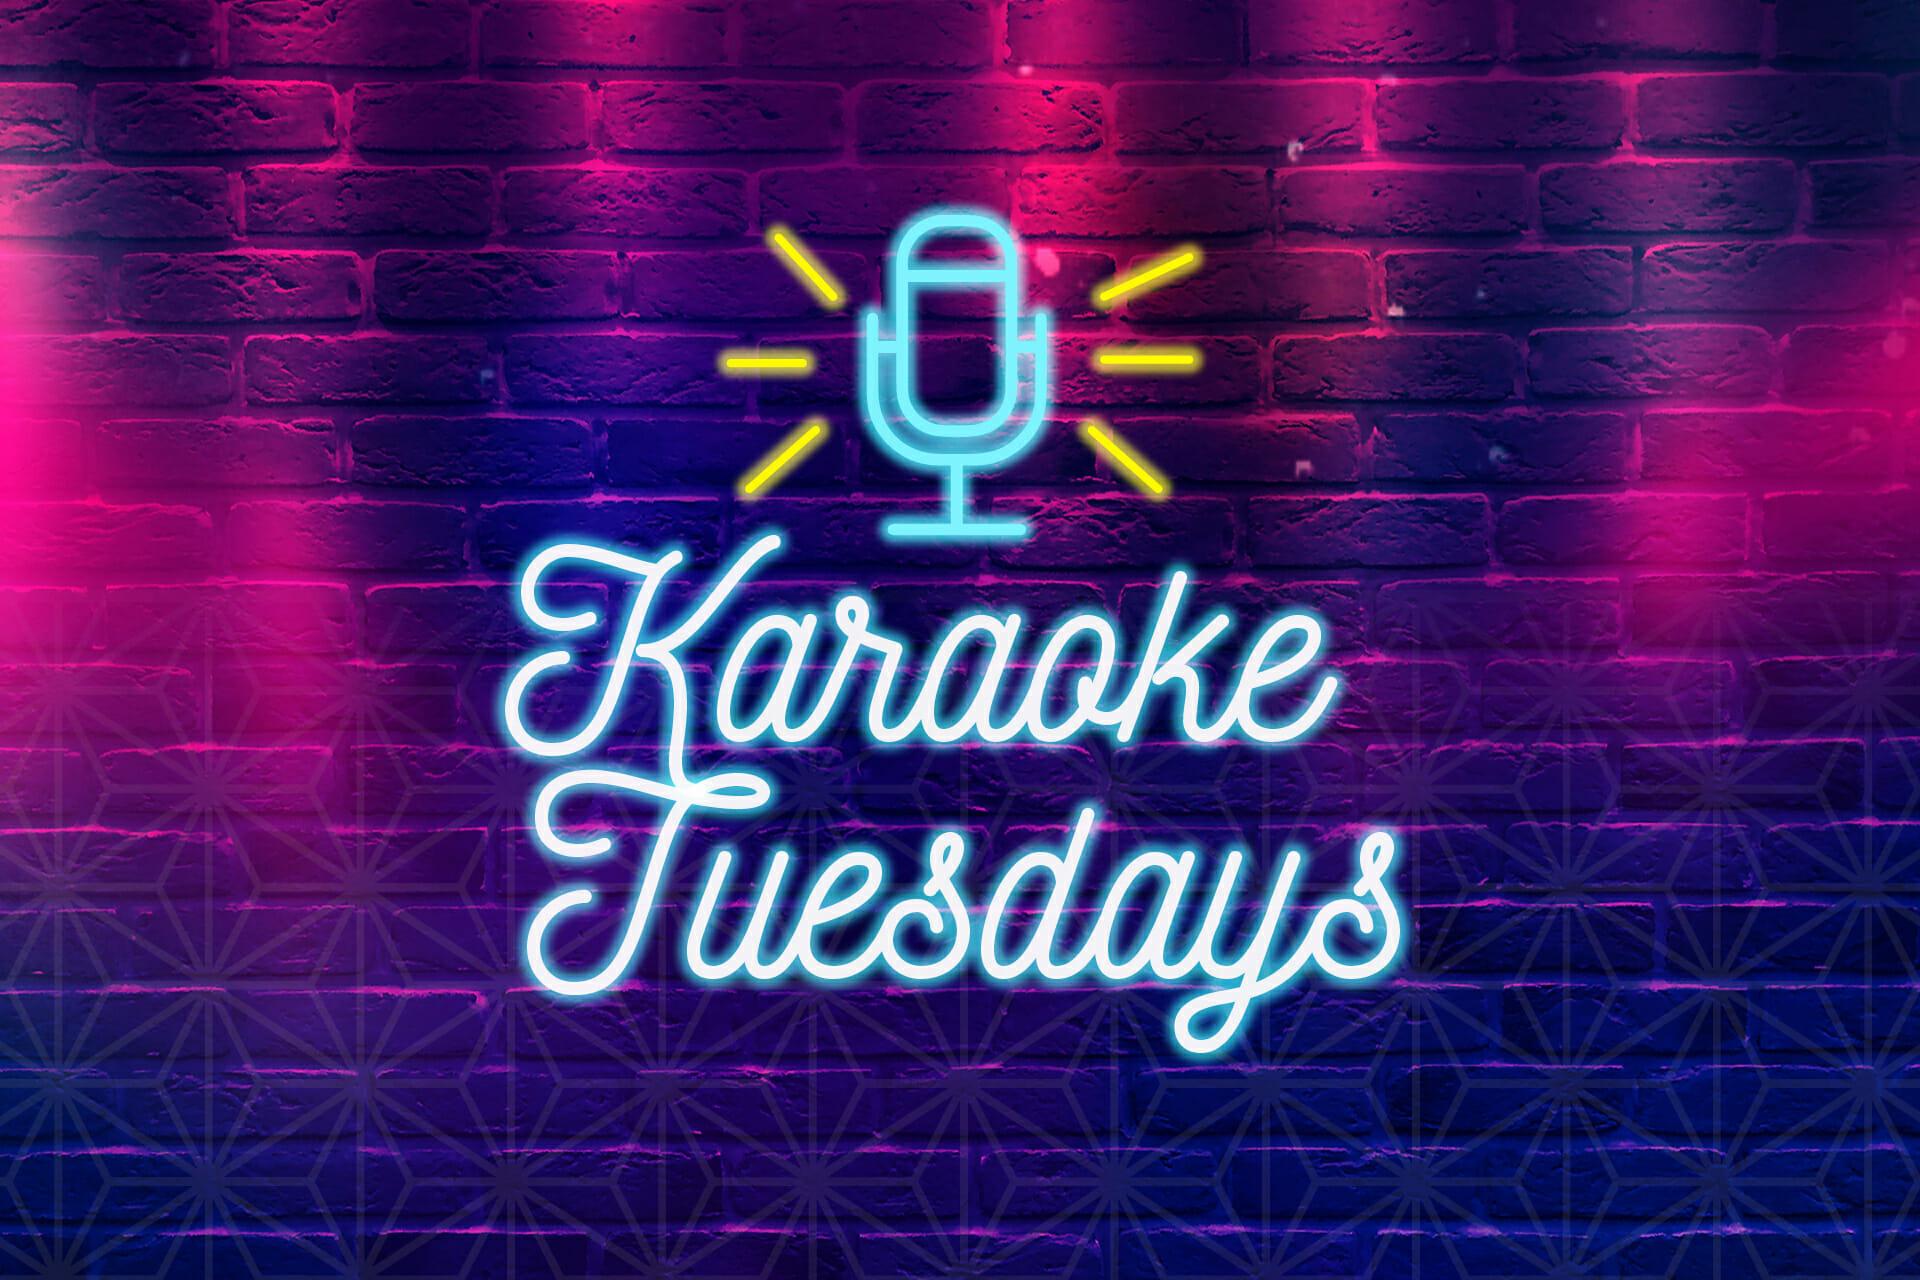 Karaoke Tuesday